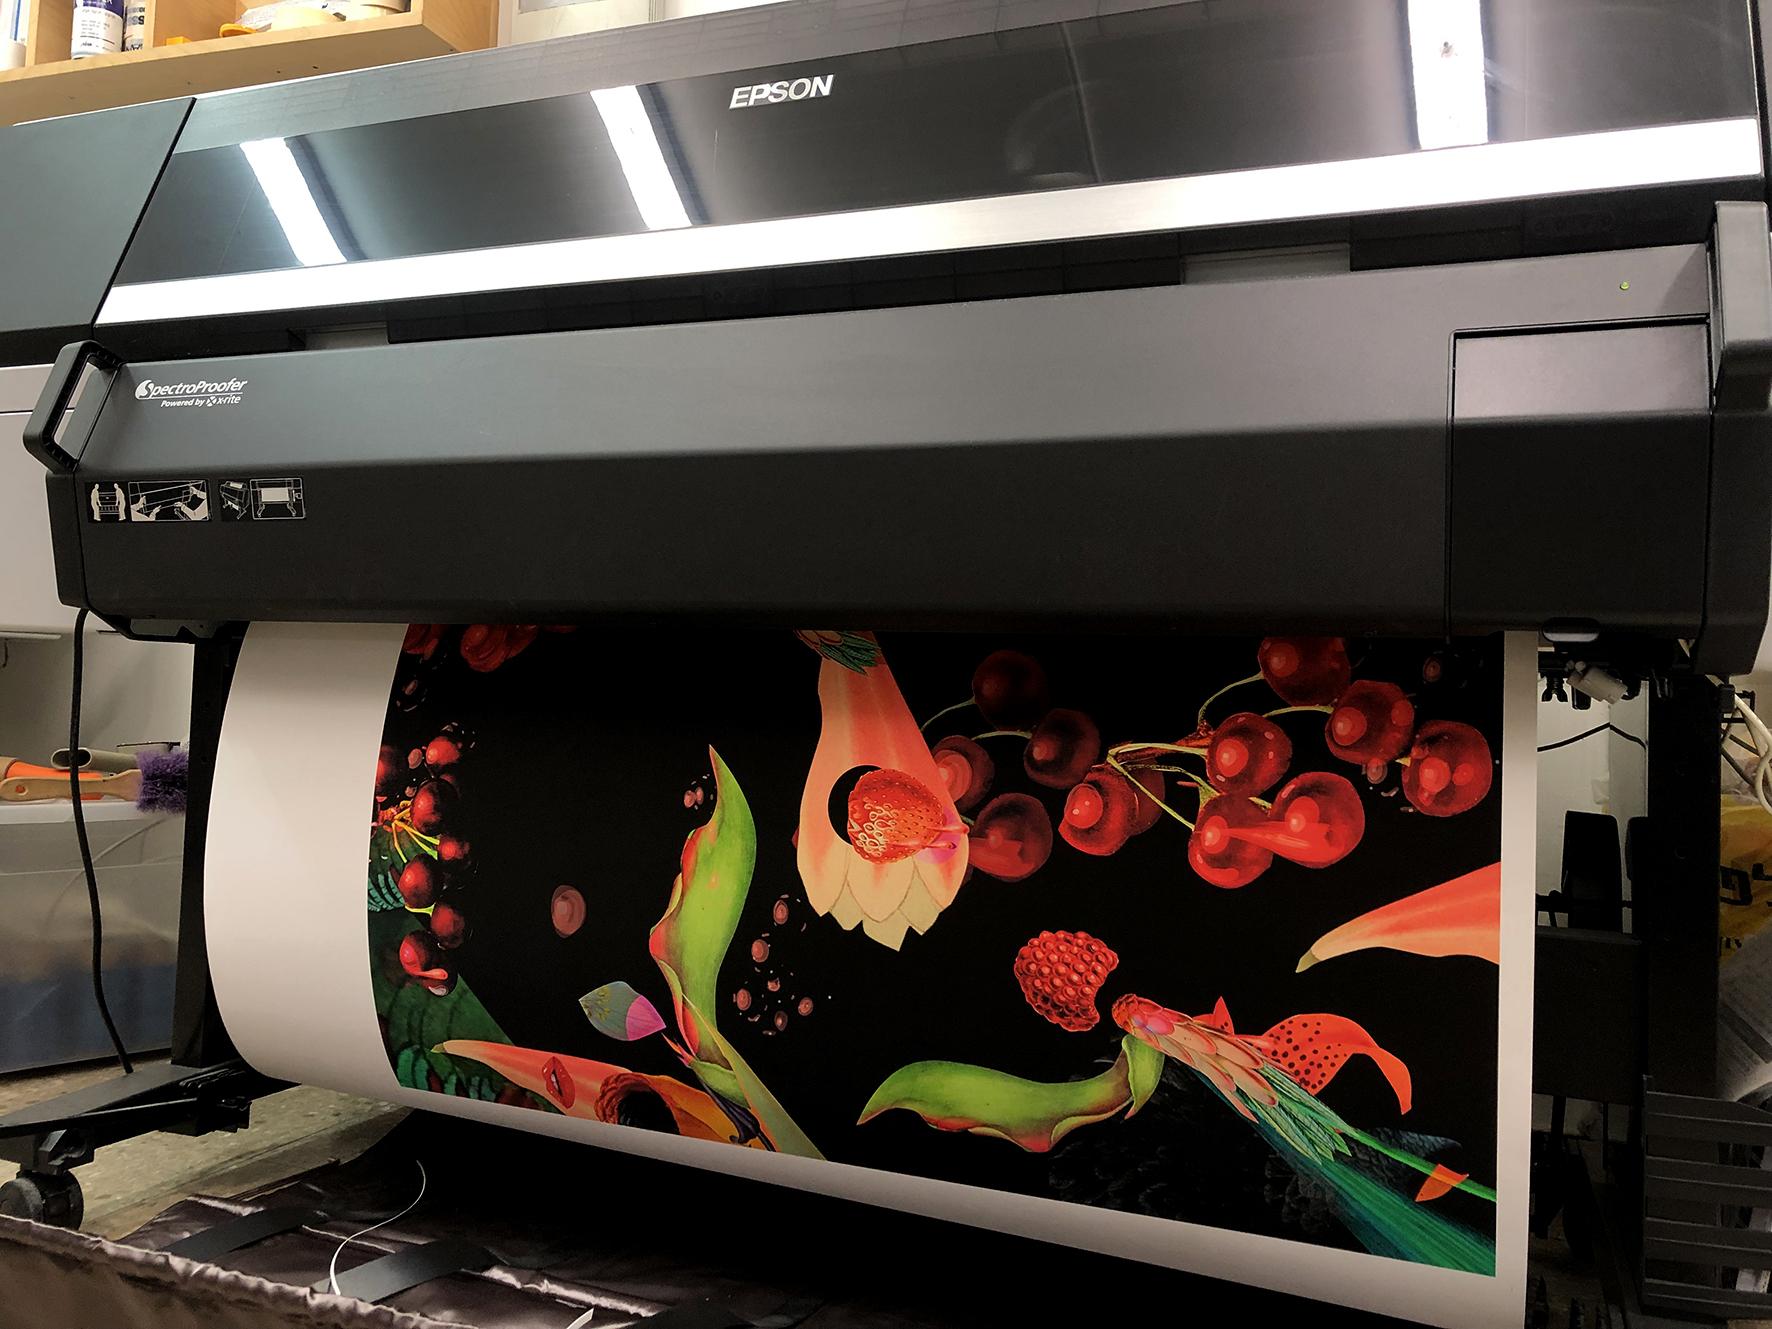 Printing the cherries @Artscan